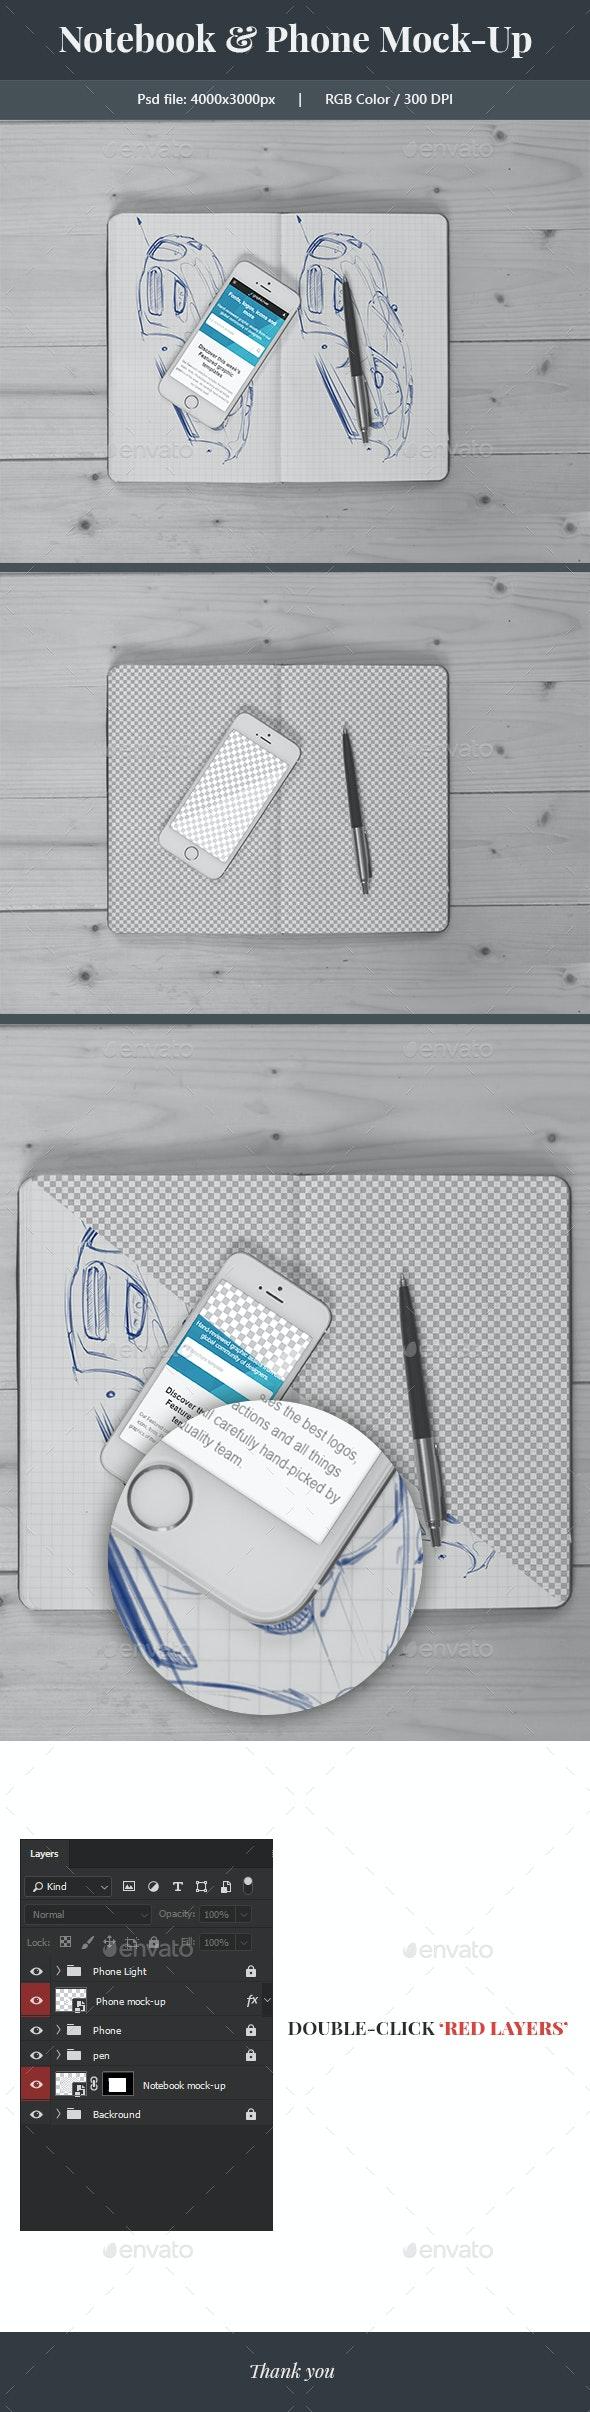 Notebook & Phone Mock-up - Mobile Displays